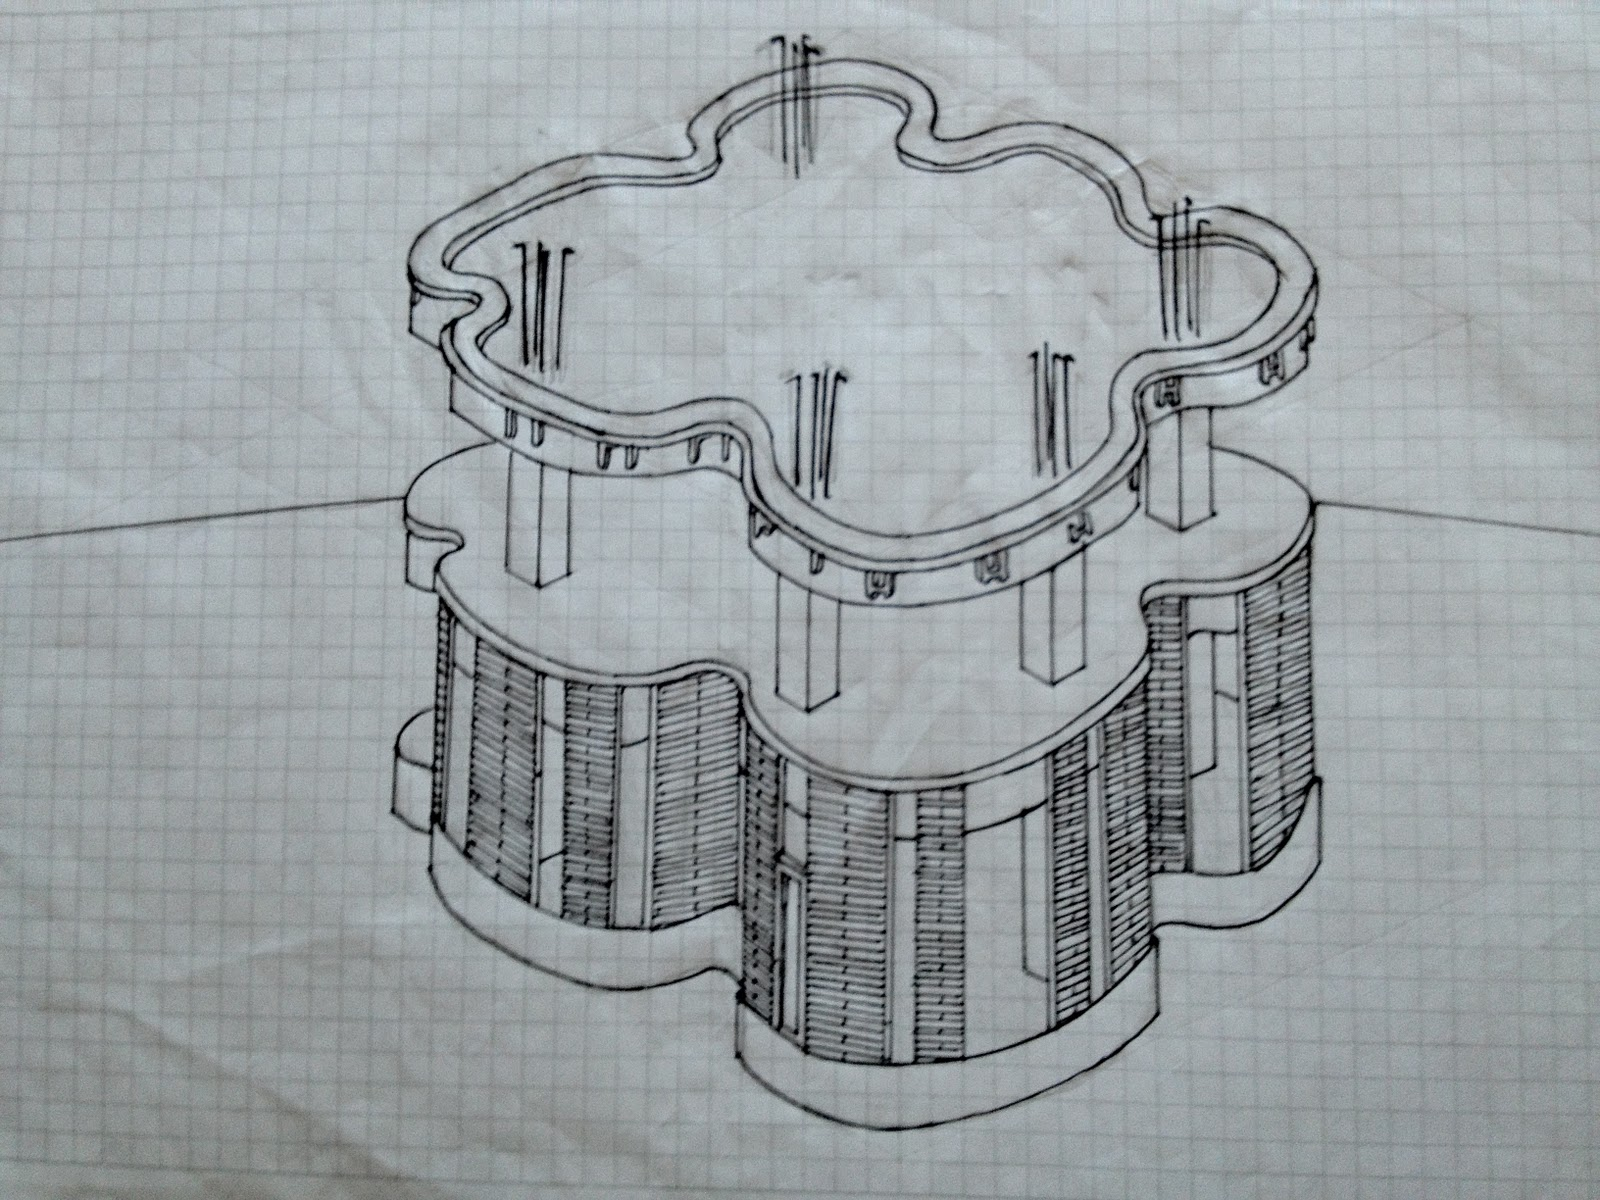 Dise o estructuras arquitect nicas for Estructuras arquitectonicas